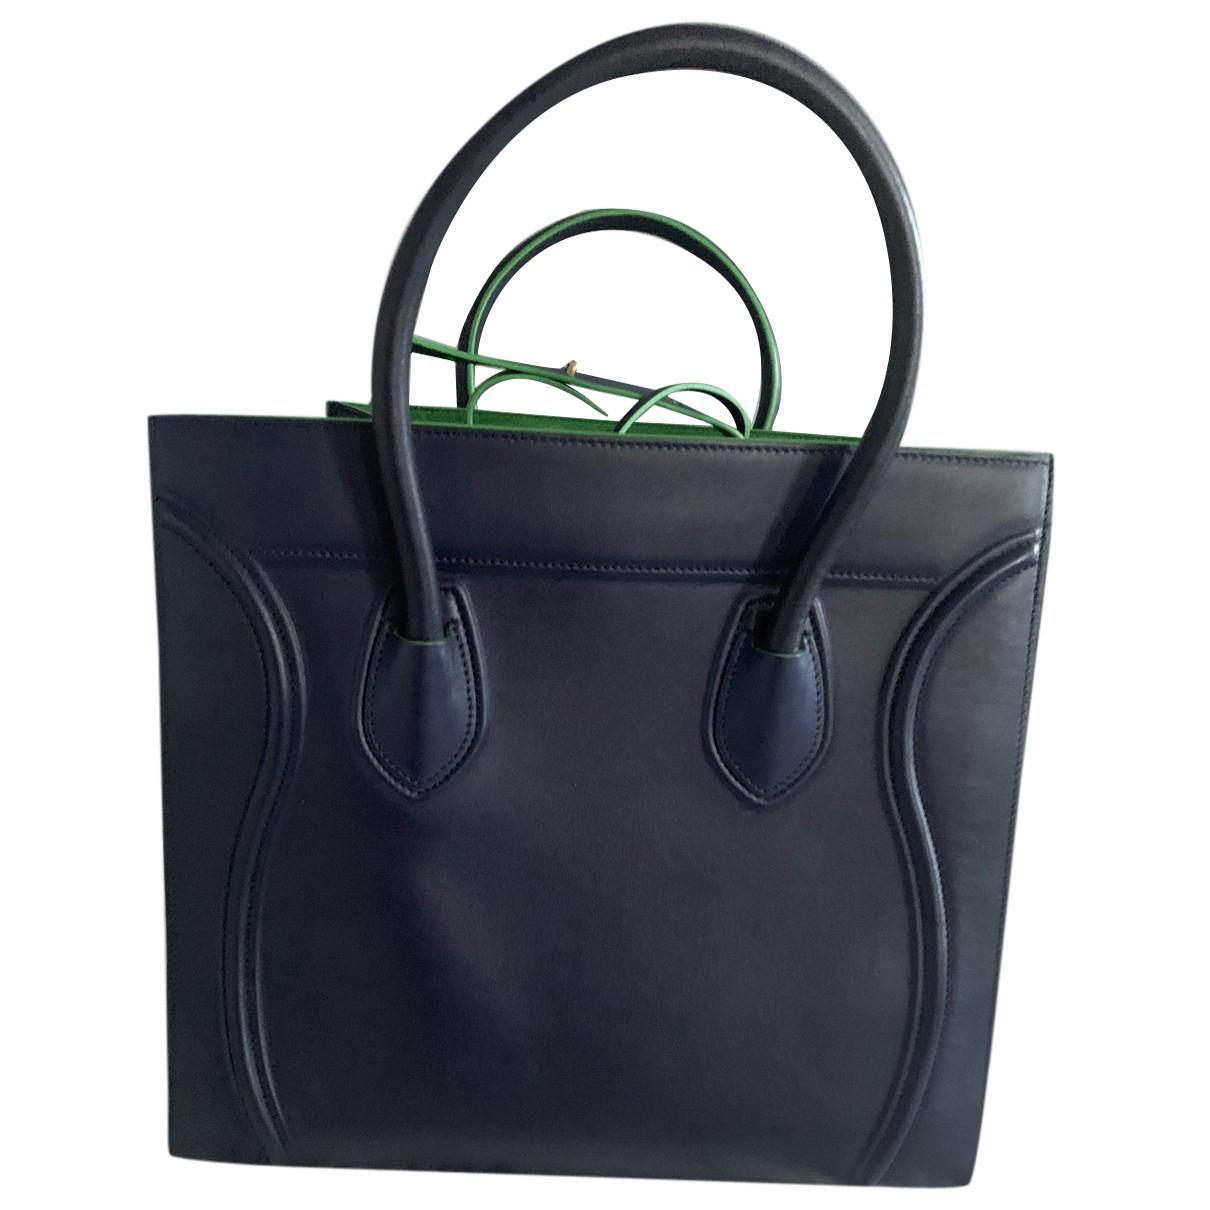 Celine Luggage Phantom Blue Leather handbag for Women N